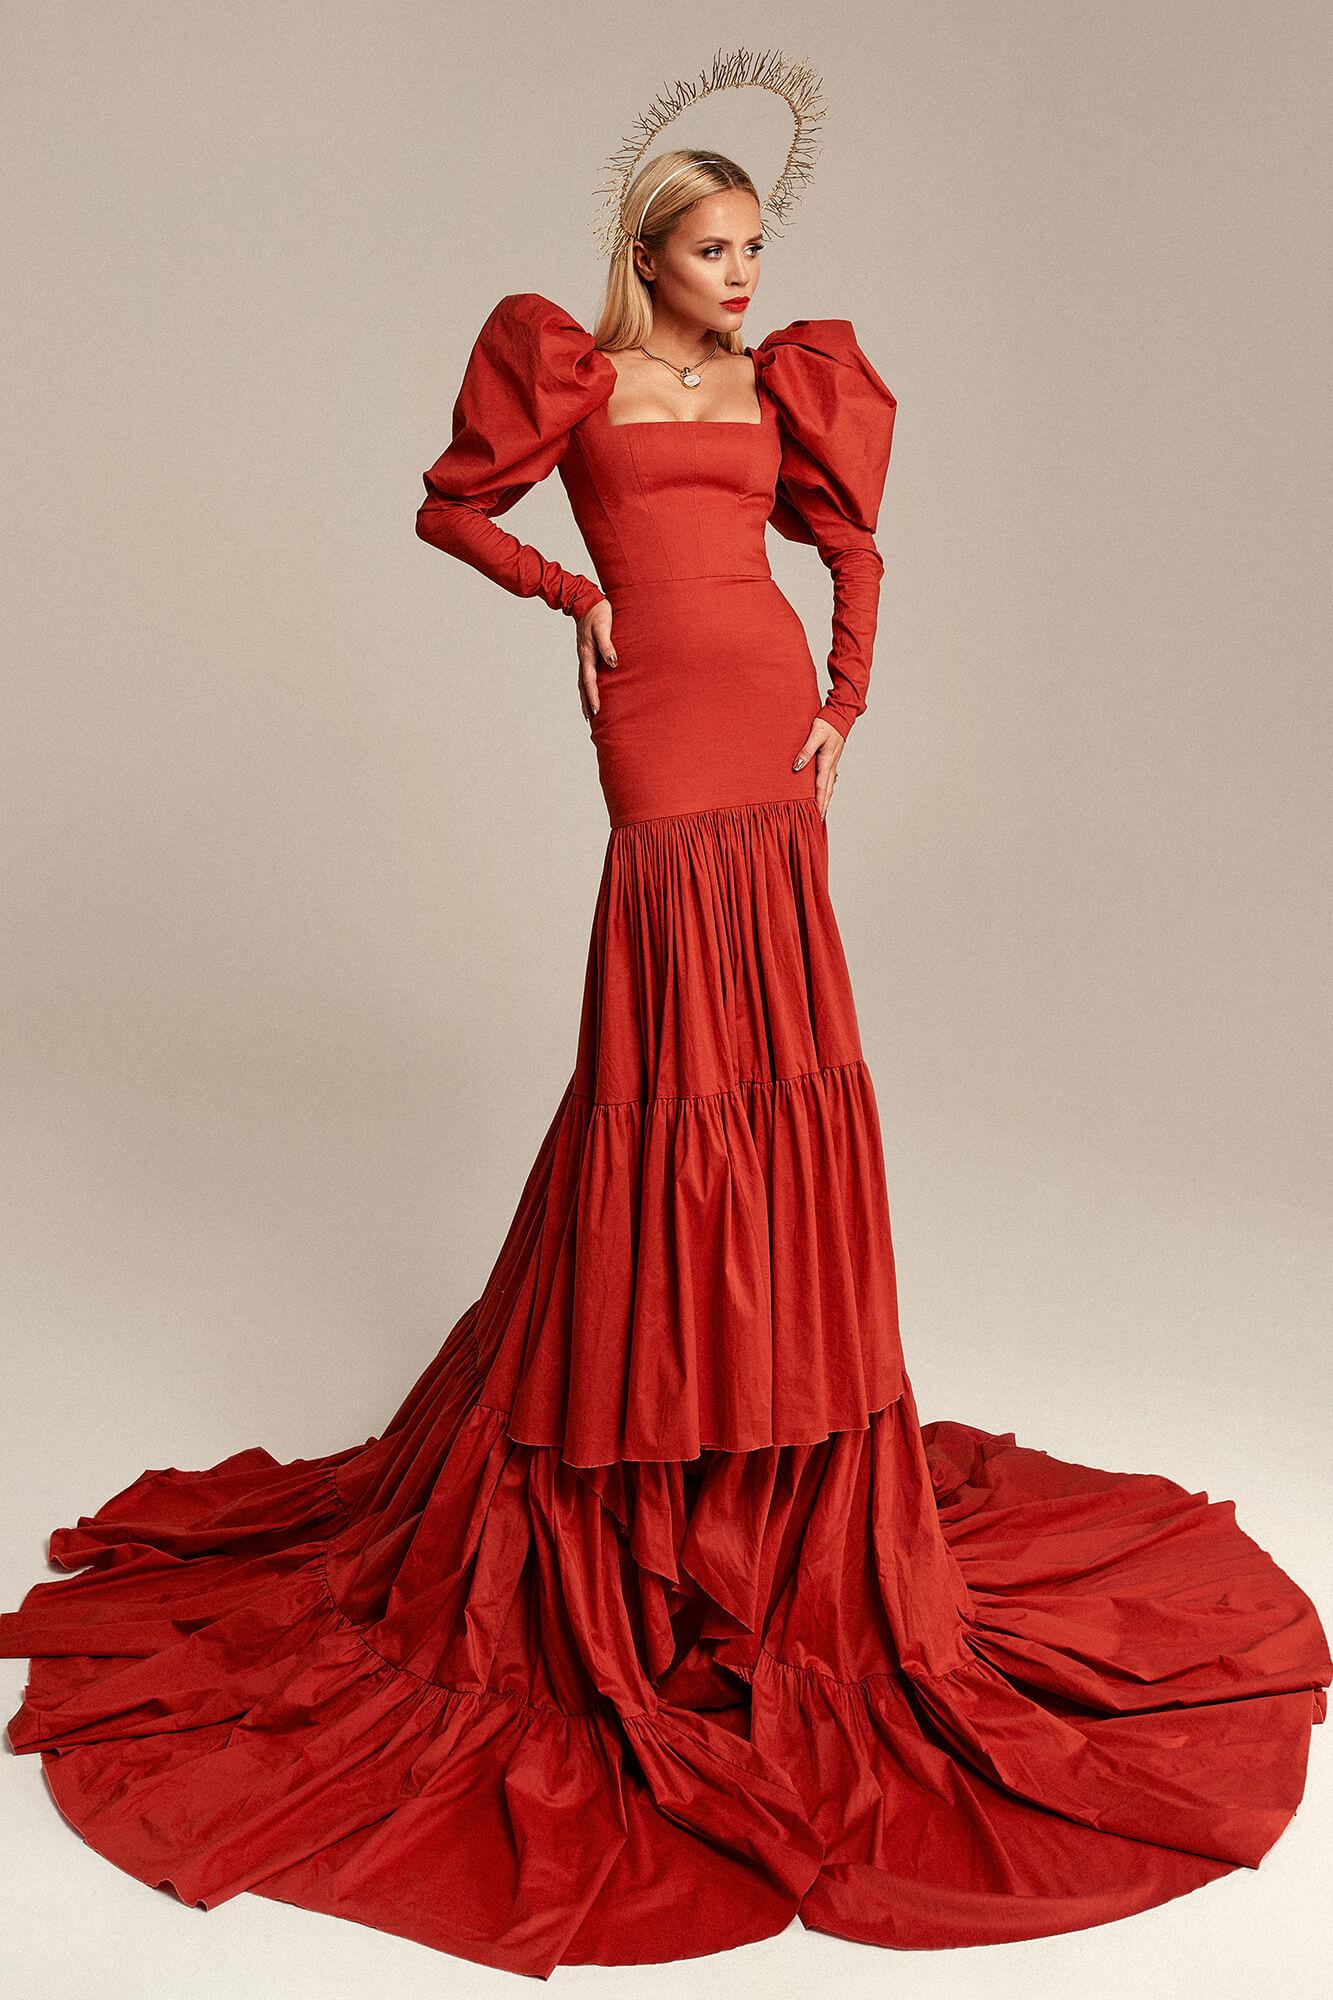 Impressive dress with train no. 2 Haute Couture collection Haute Couture 2